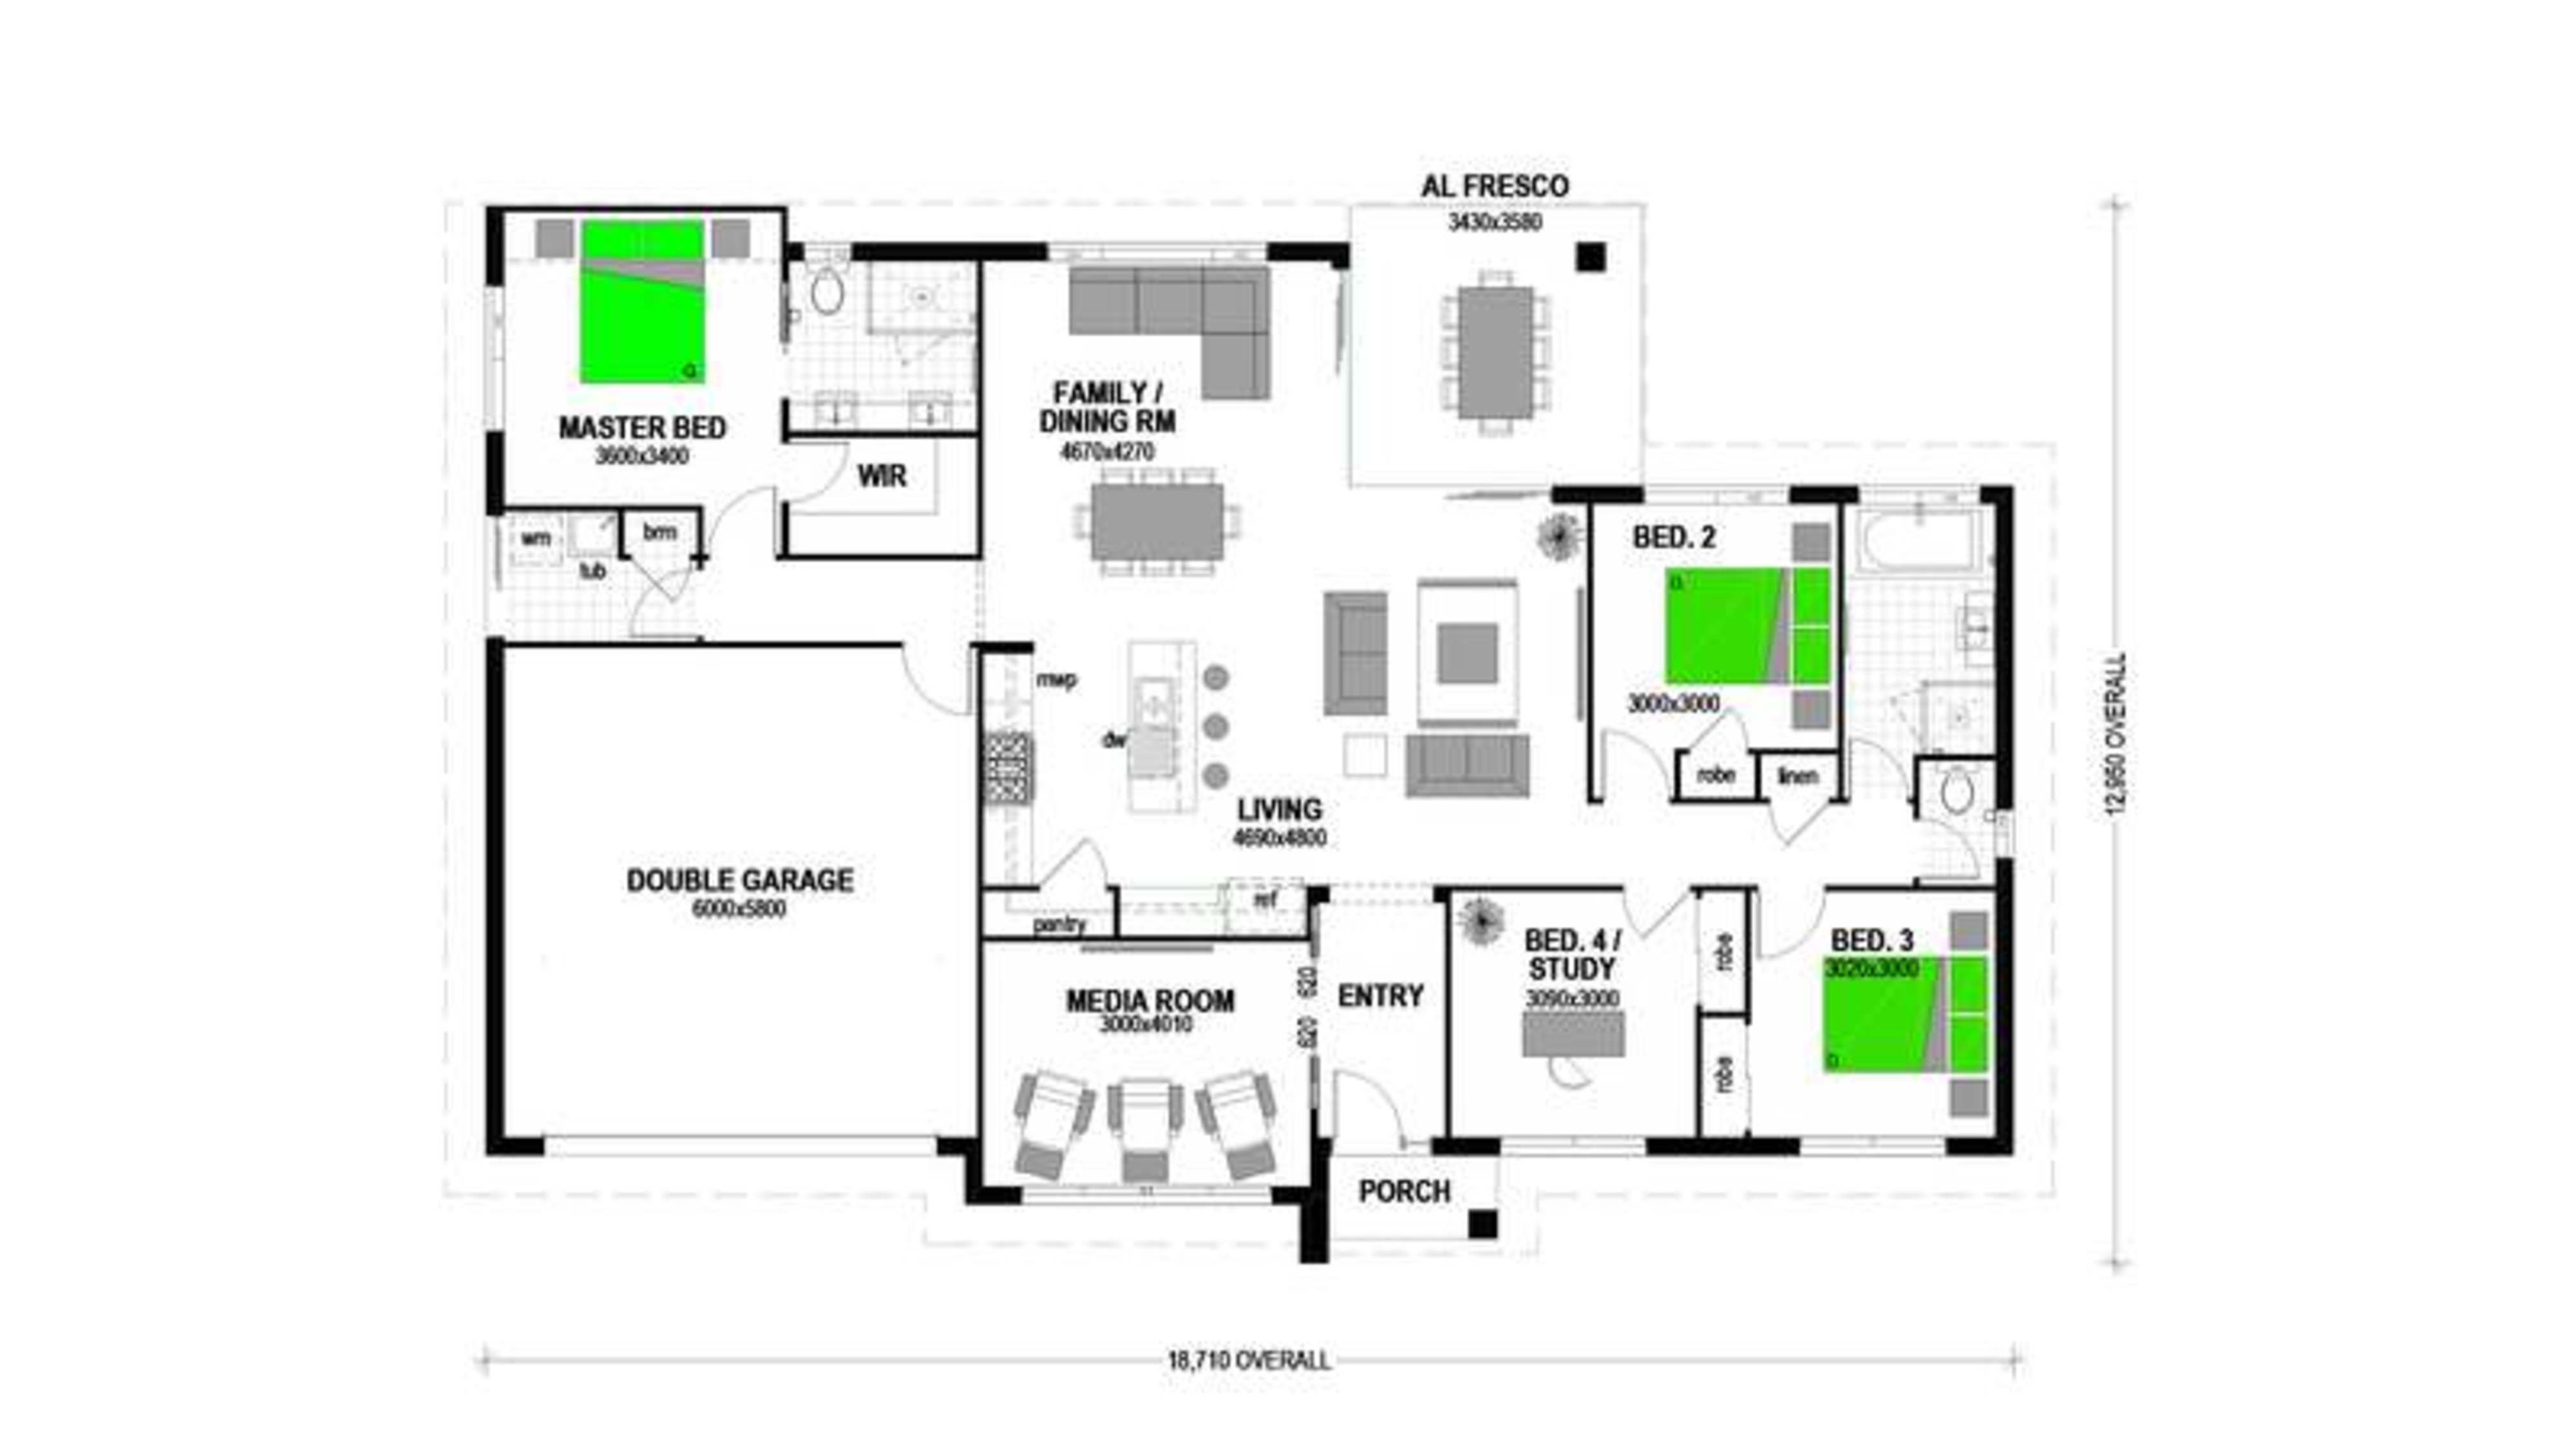 LOT 460 NORTH HARBOUR BURPENGARY EAST Floorplan